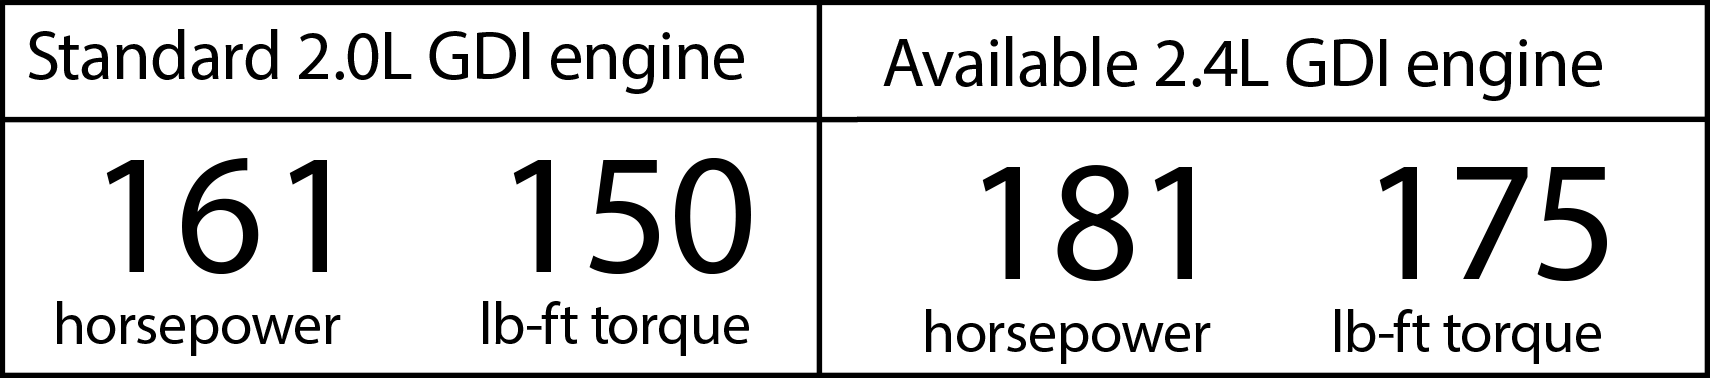 2020 Tuscon Engine